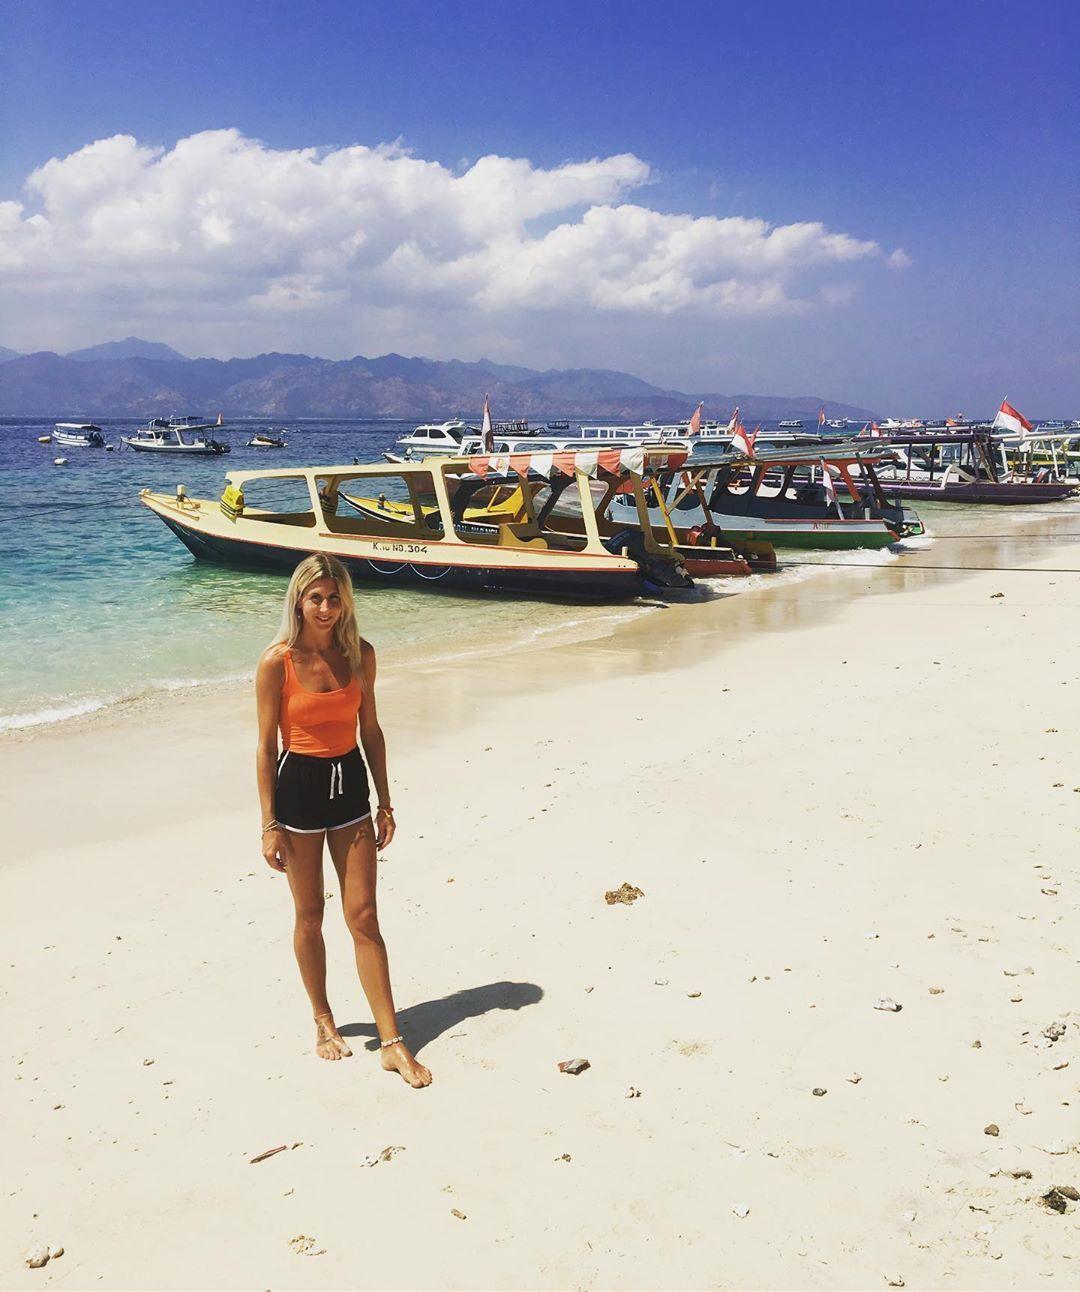 Island life is a bit of me 😏 #gili #gilit #island #islandlife #beach #beachlife #sea #sand #boats #whitesand #love #travel #traveller #seetheworld #catchflights #holiday